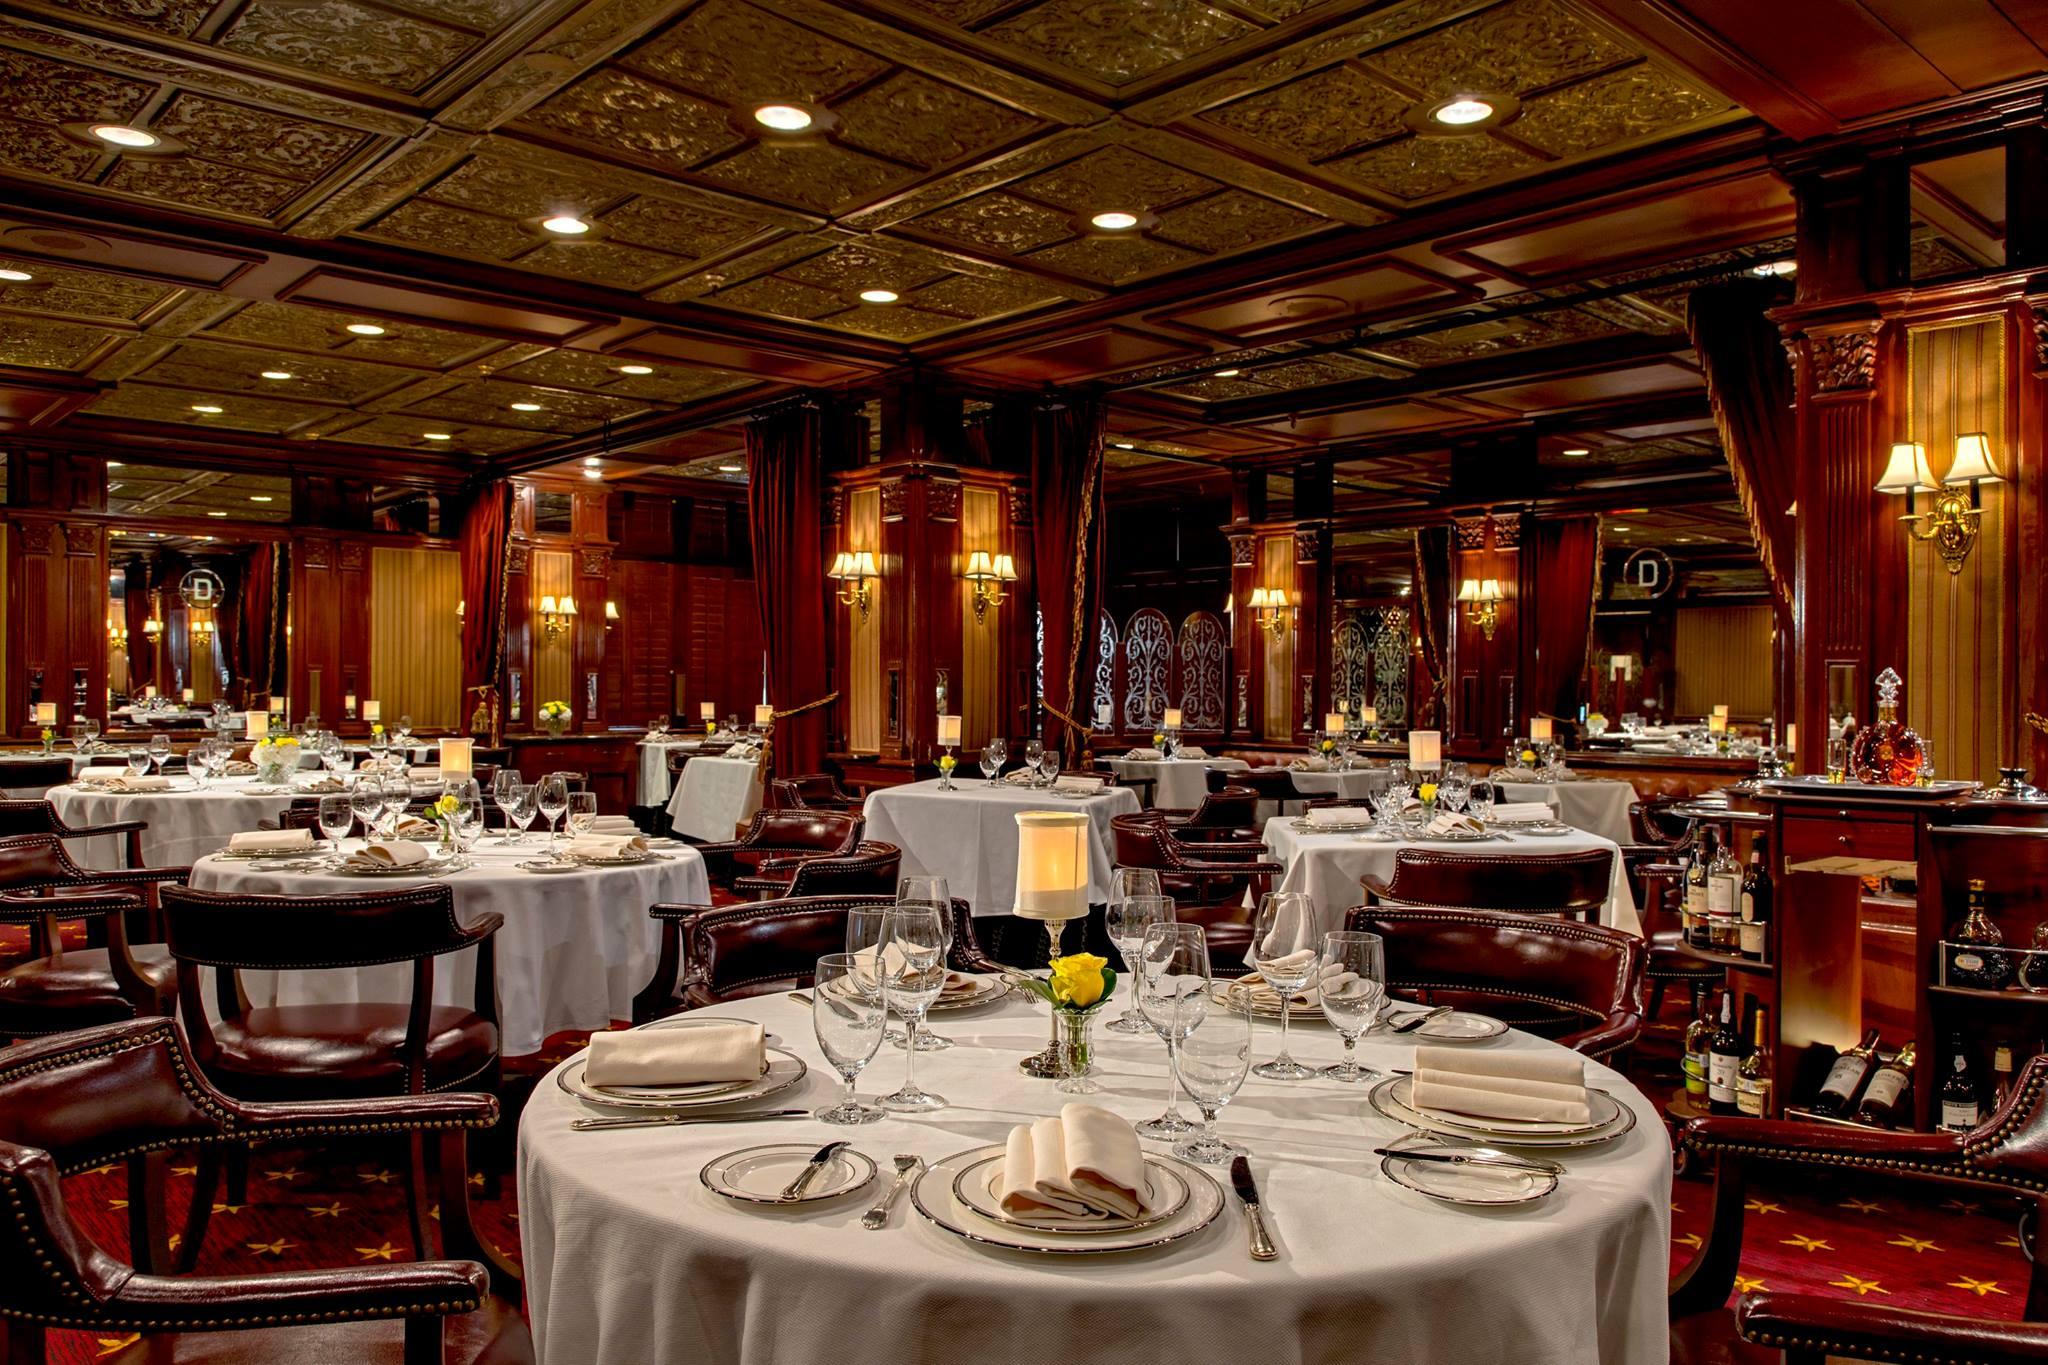 15 Restaurants To Splurge On An Upscale Dinner In Austin